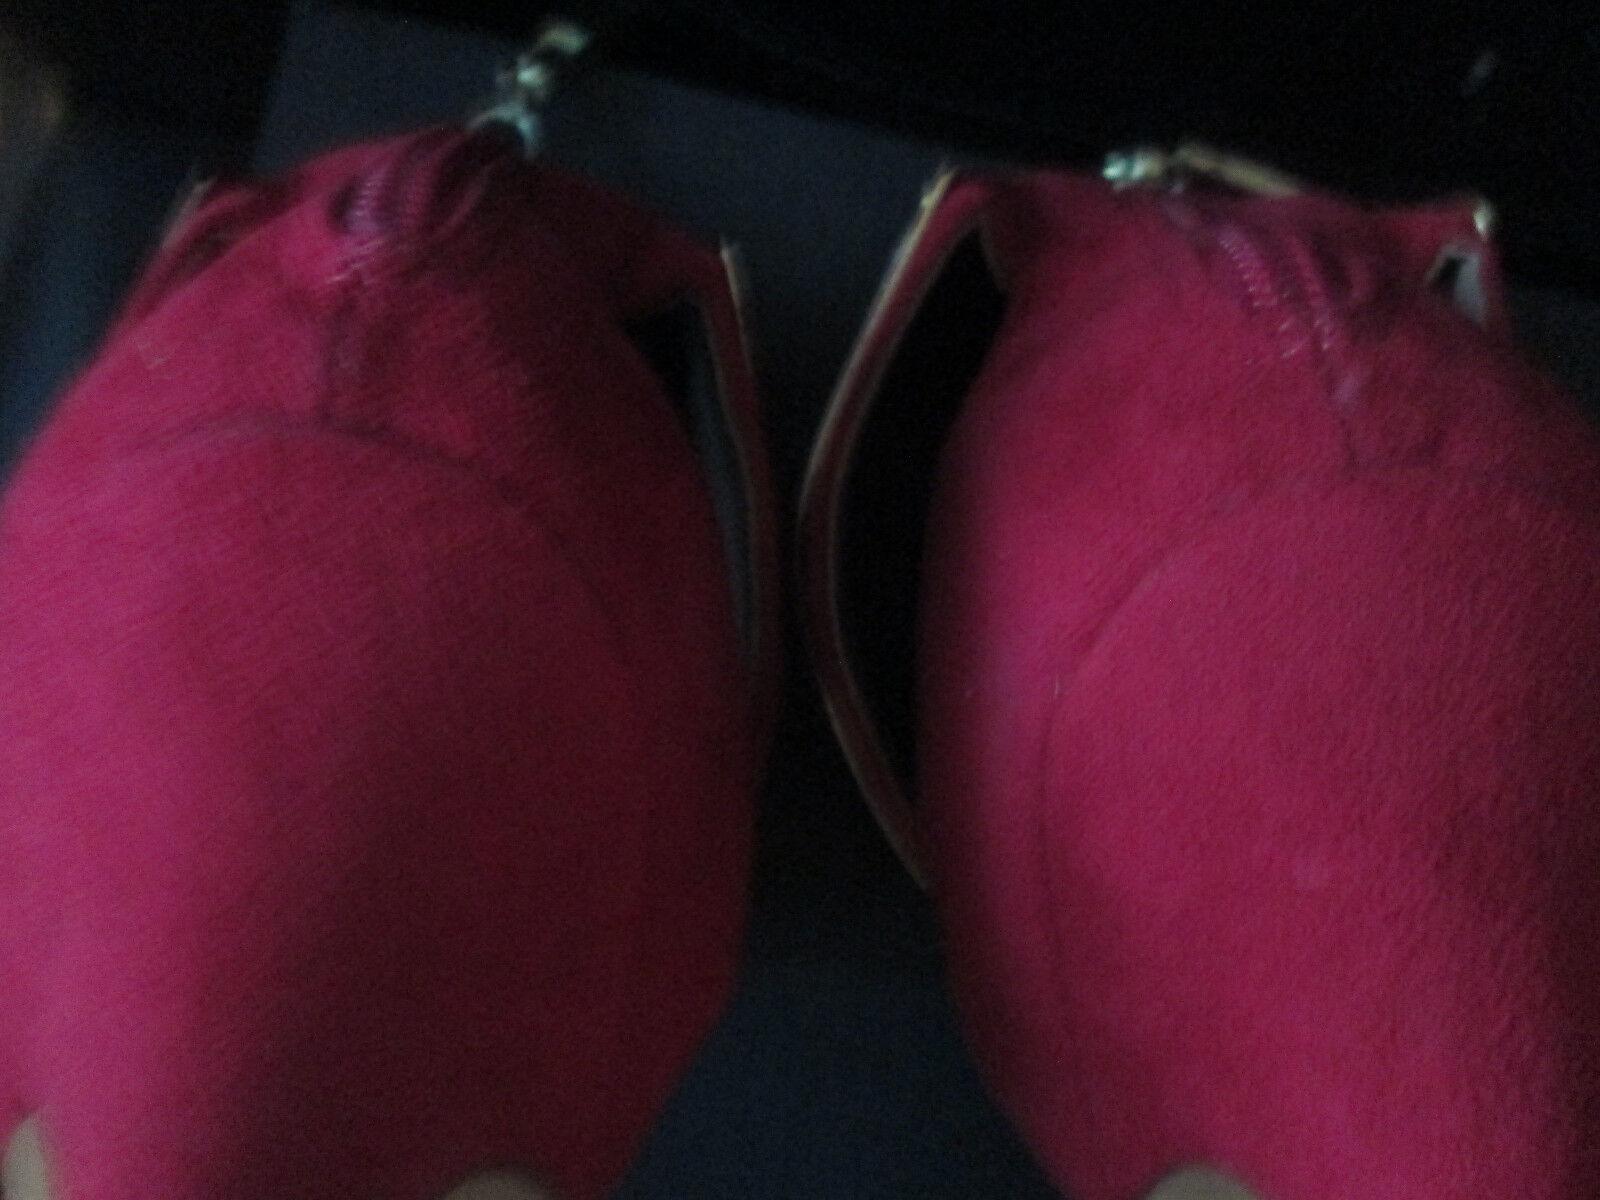 Bebe pink fushia Sandales design ankle cuff sparkle  design Sandales  7 very sexy 3f4004